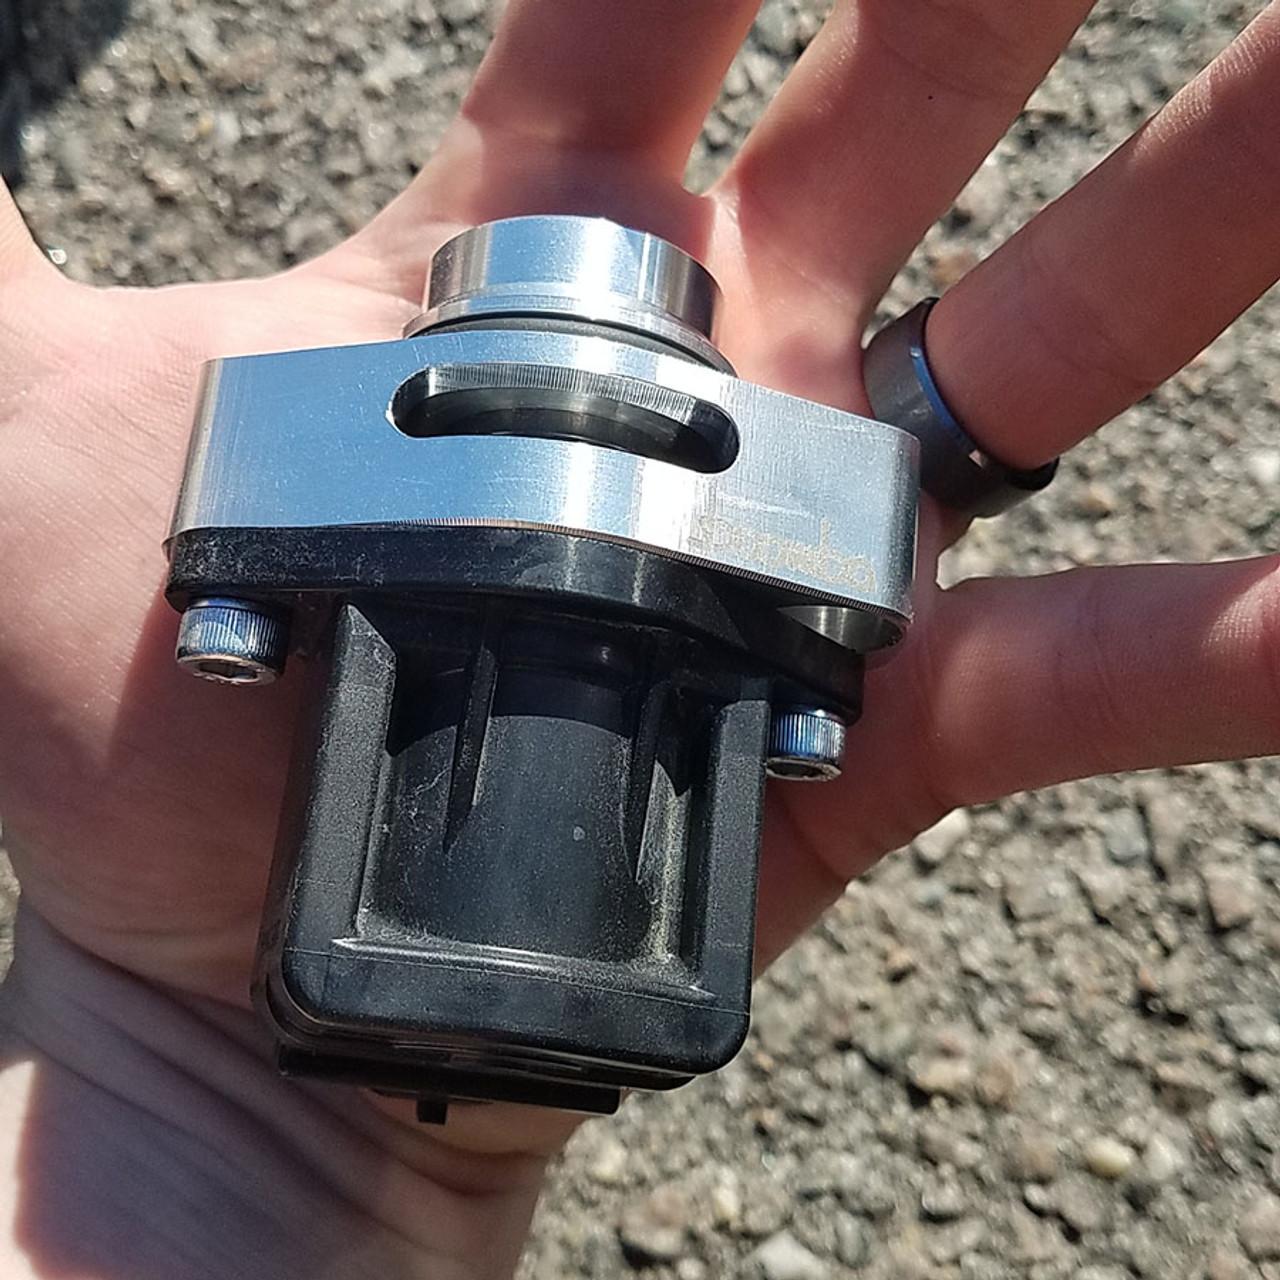 Ford Ecoboost V6 Blow Off Valve Adapter [BOVA] V1